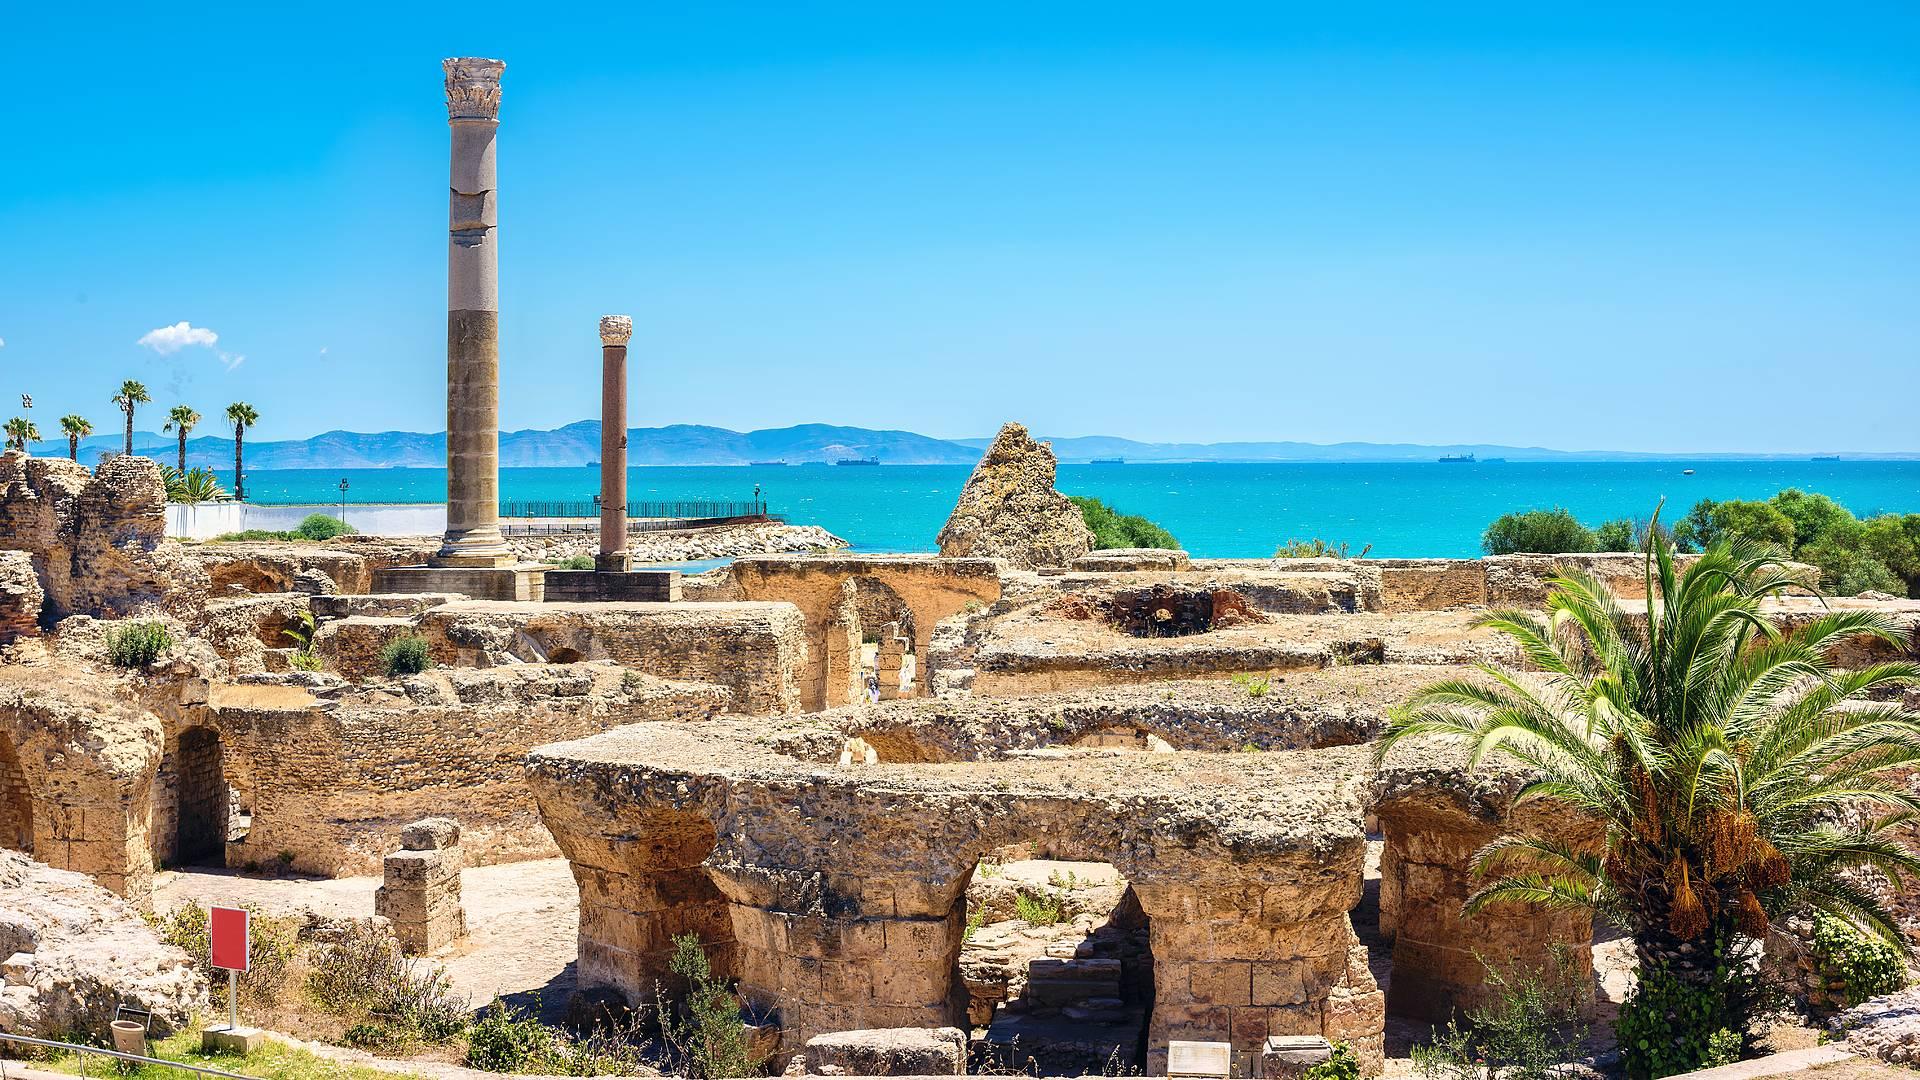 Playas de Susa por rutas históricas y arqueológicas